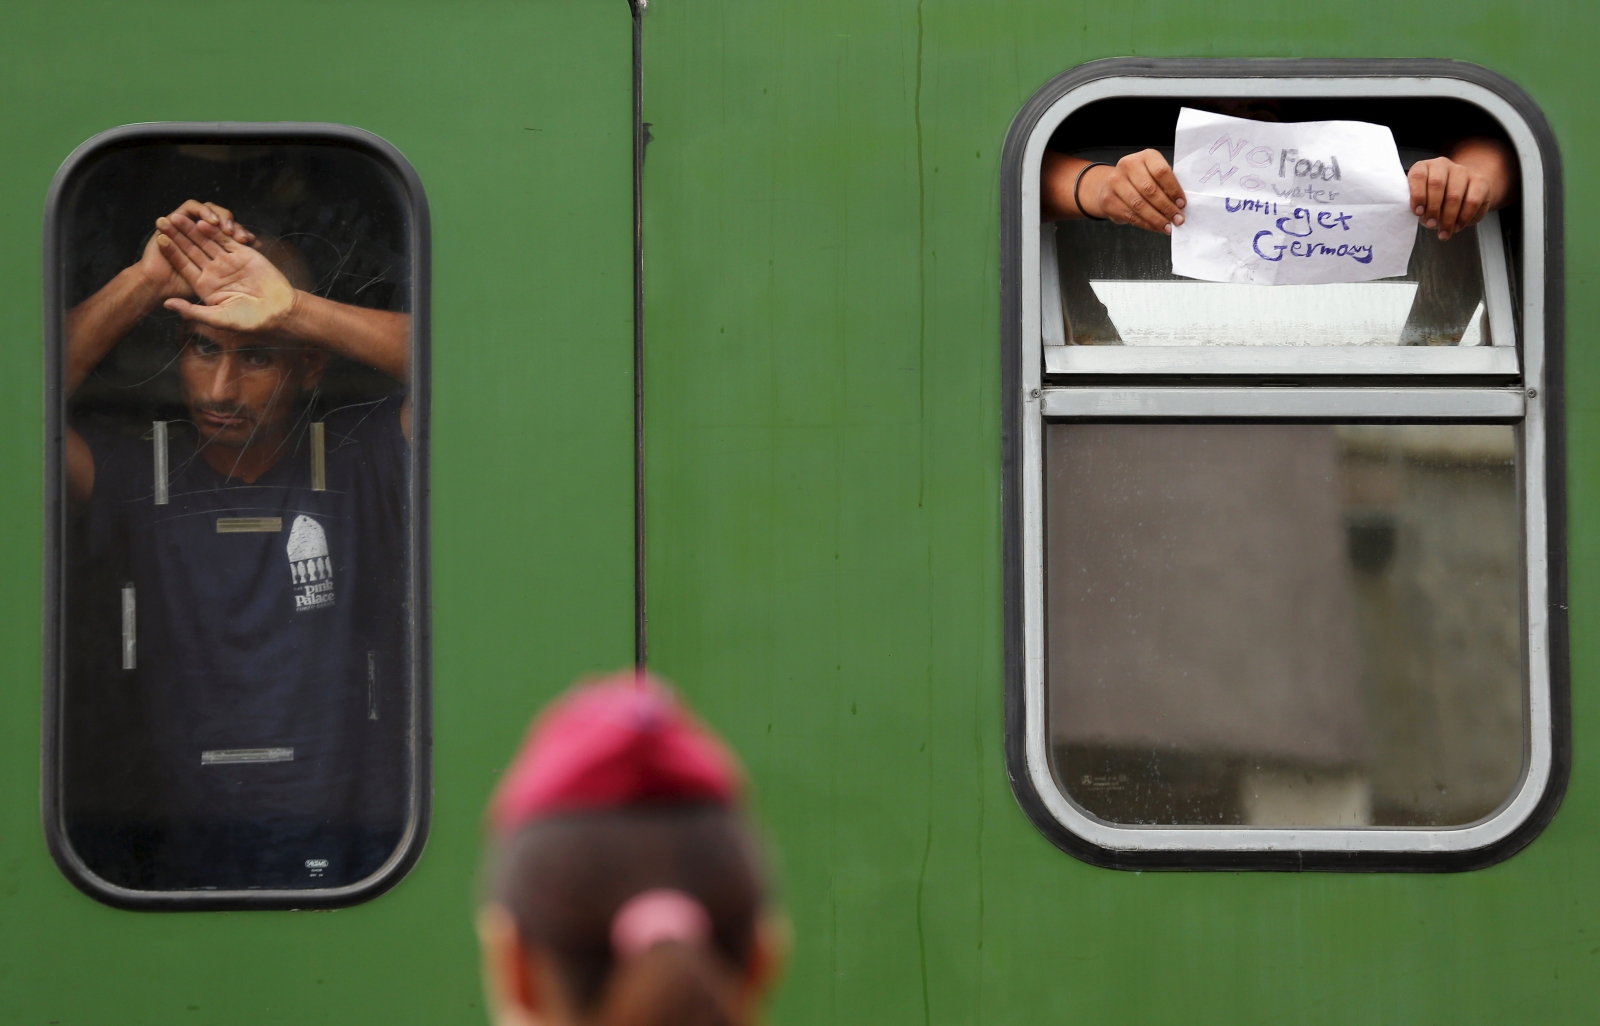 Bicske Hungary migrant train standoff